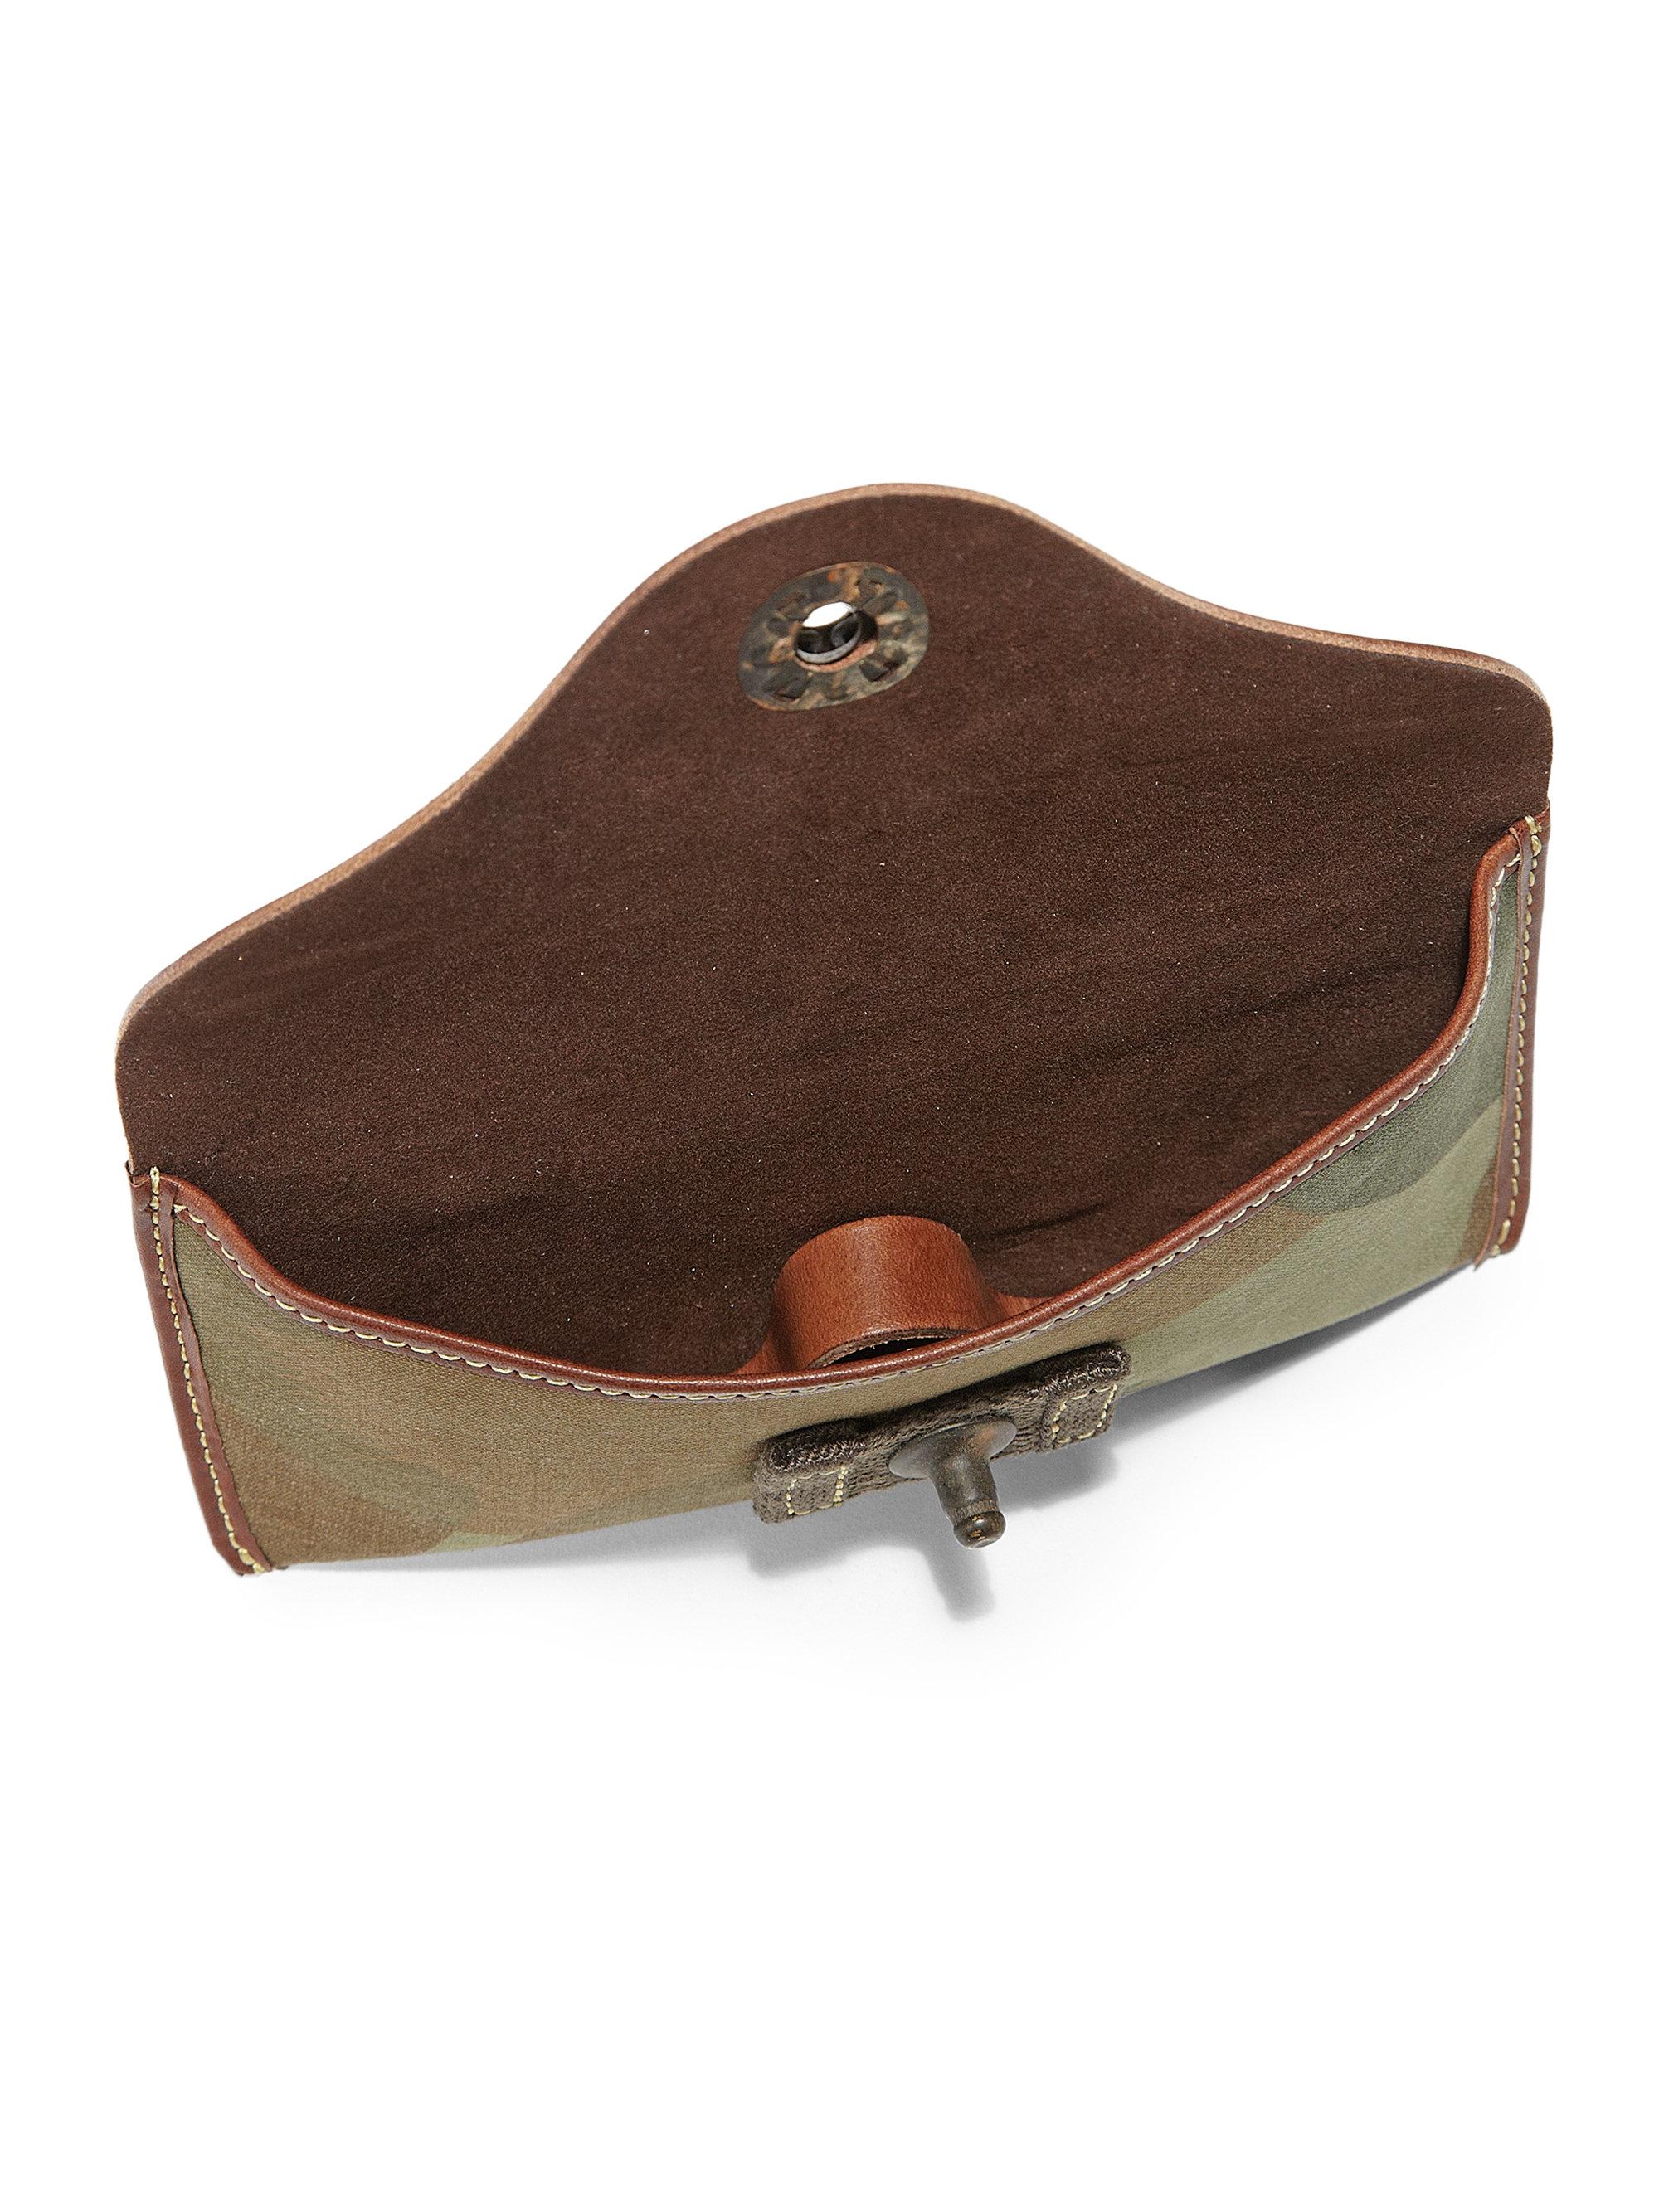 e93e8fbed661 Polo Ralph Lauren Camo Canvas Sunglass Case in Brown for Men - Lyst